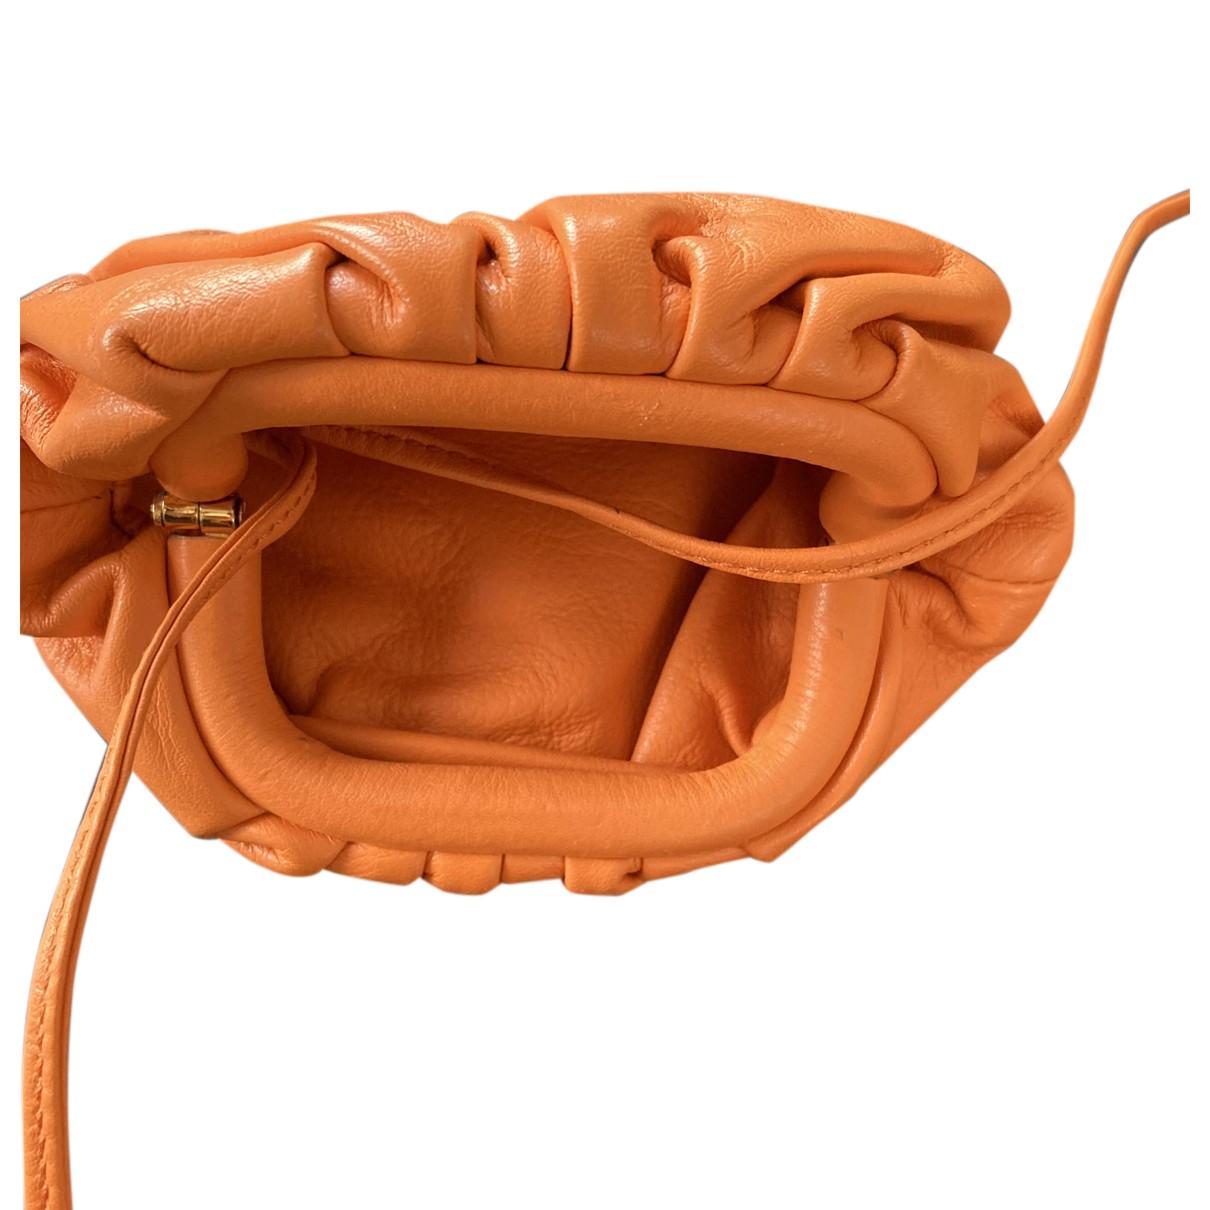 Bottega Veneta Pouch Clutch in  Orange Leder